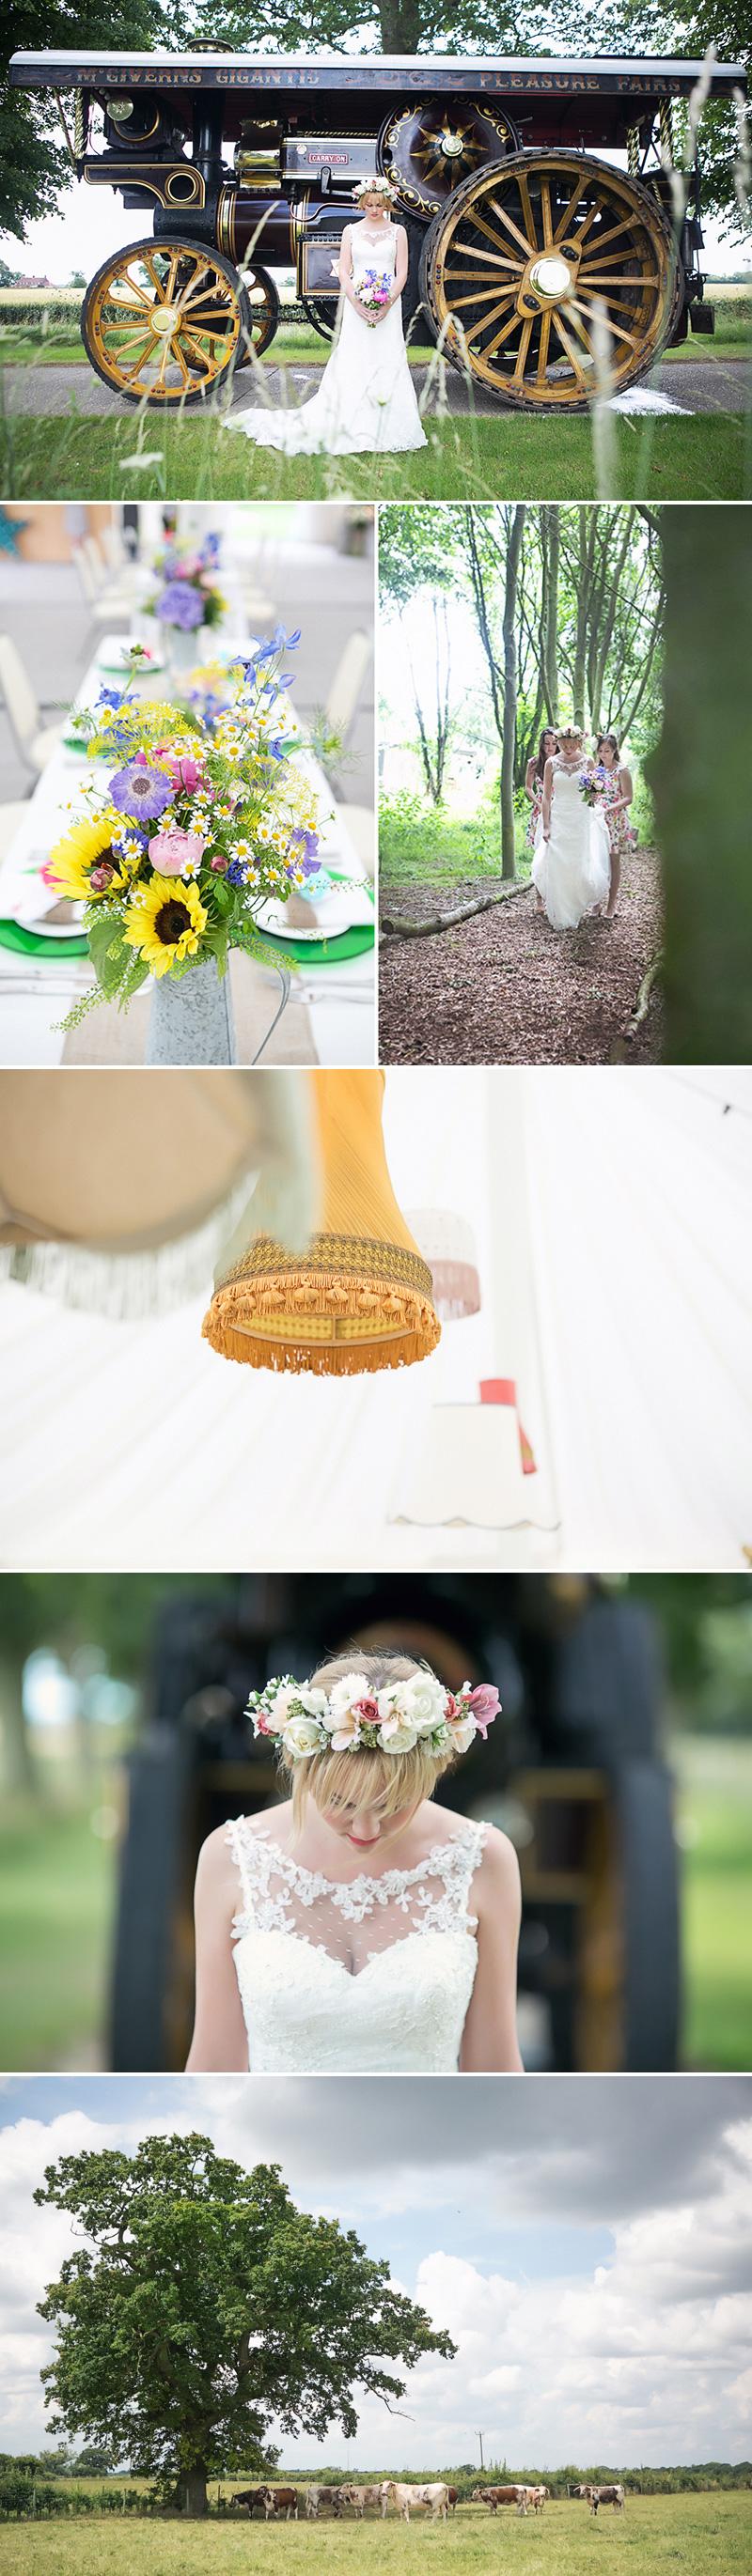 village-fete-themed-wedding-styled-shoot-kenton-hall-estate-nick-ilott-photography-coco-wedding-venues-layer-2